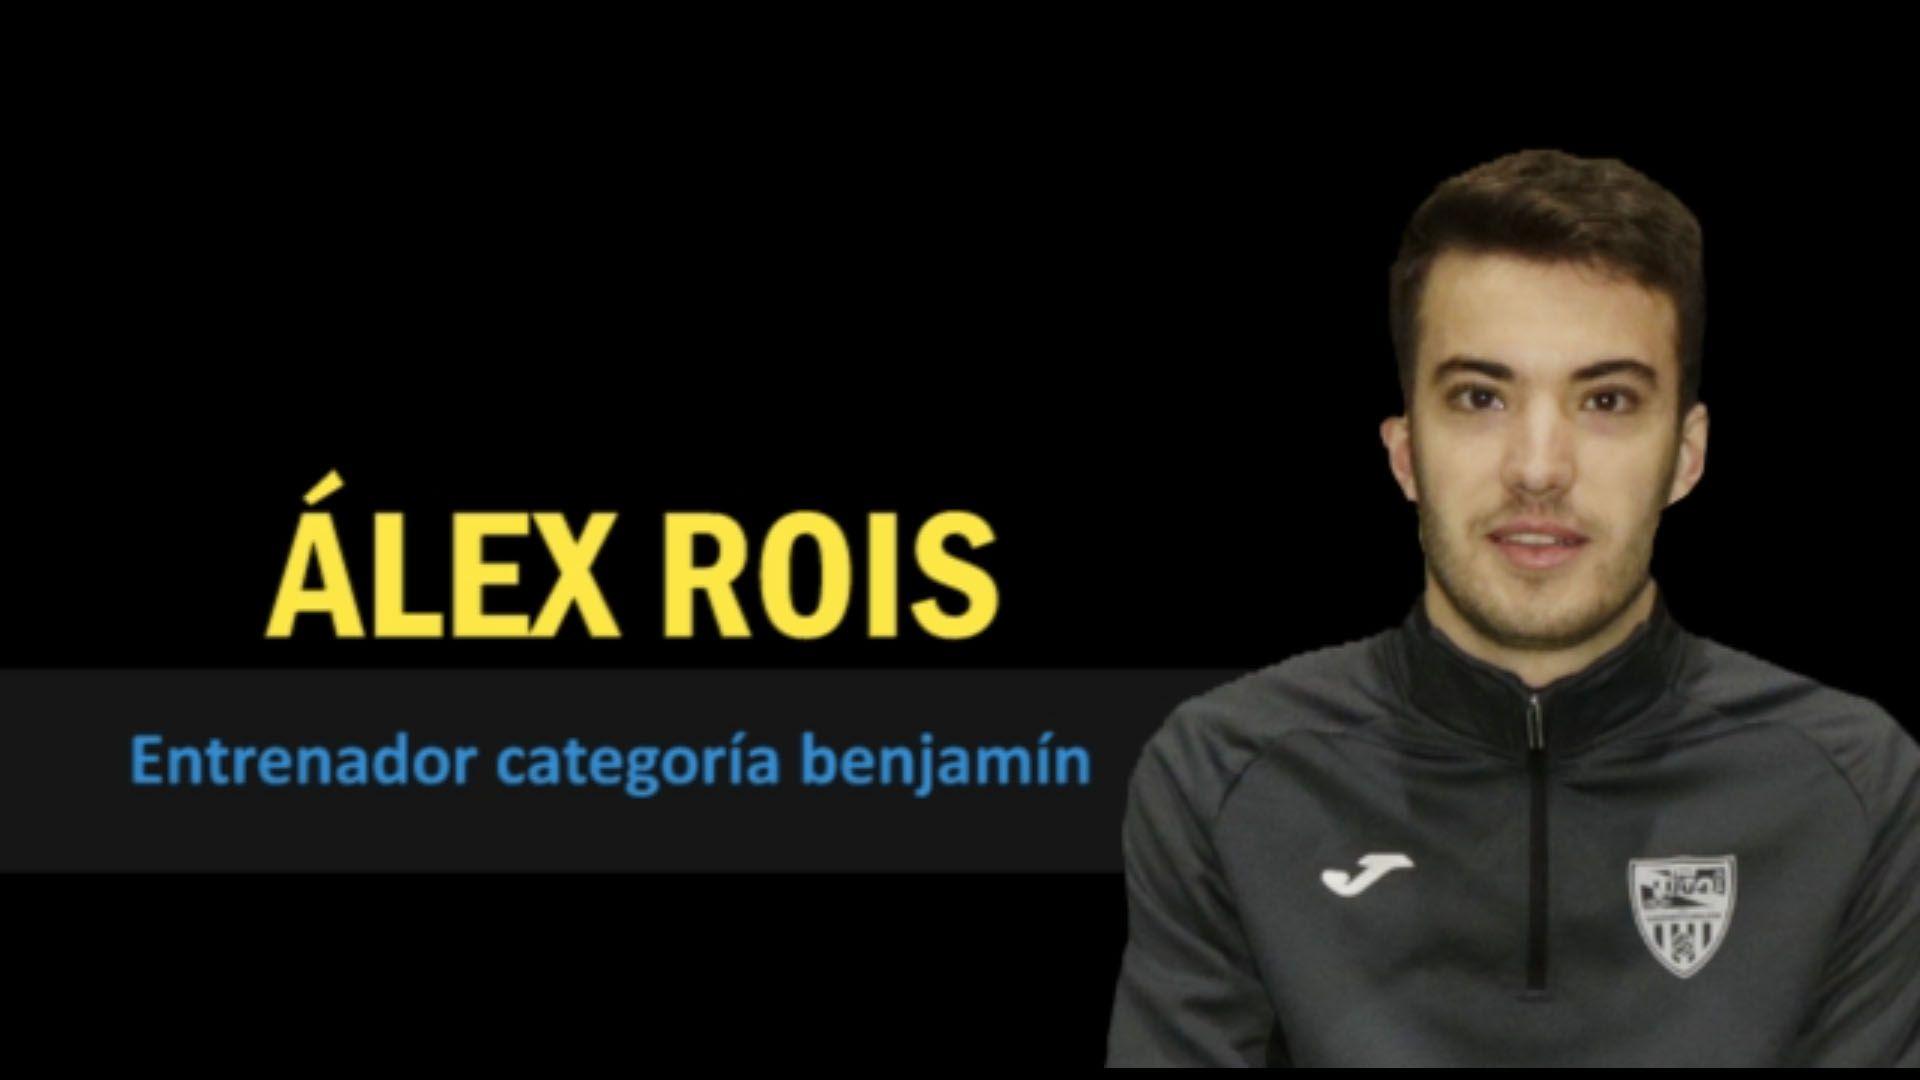 Conociendo a: ÁLEX ROIS